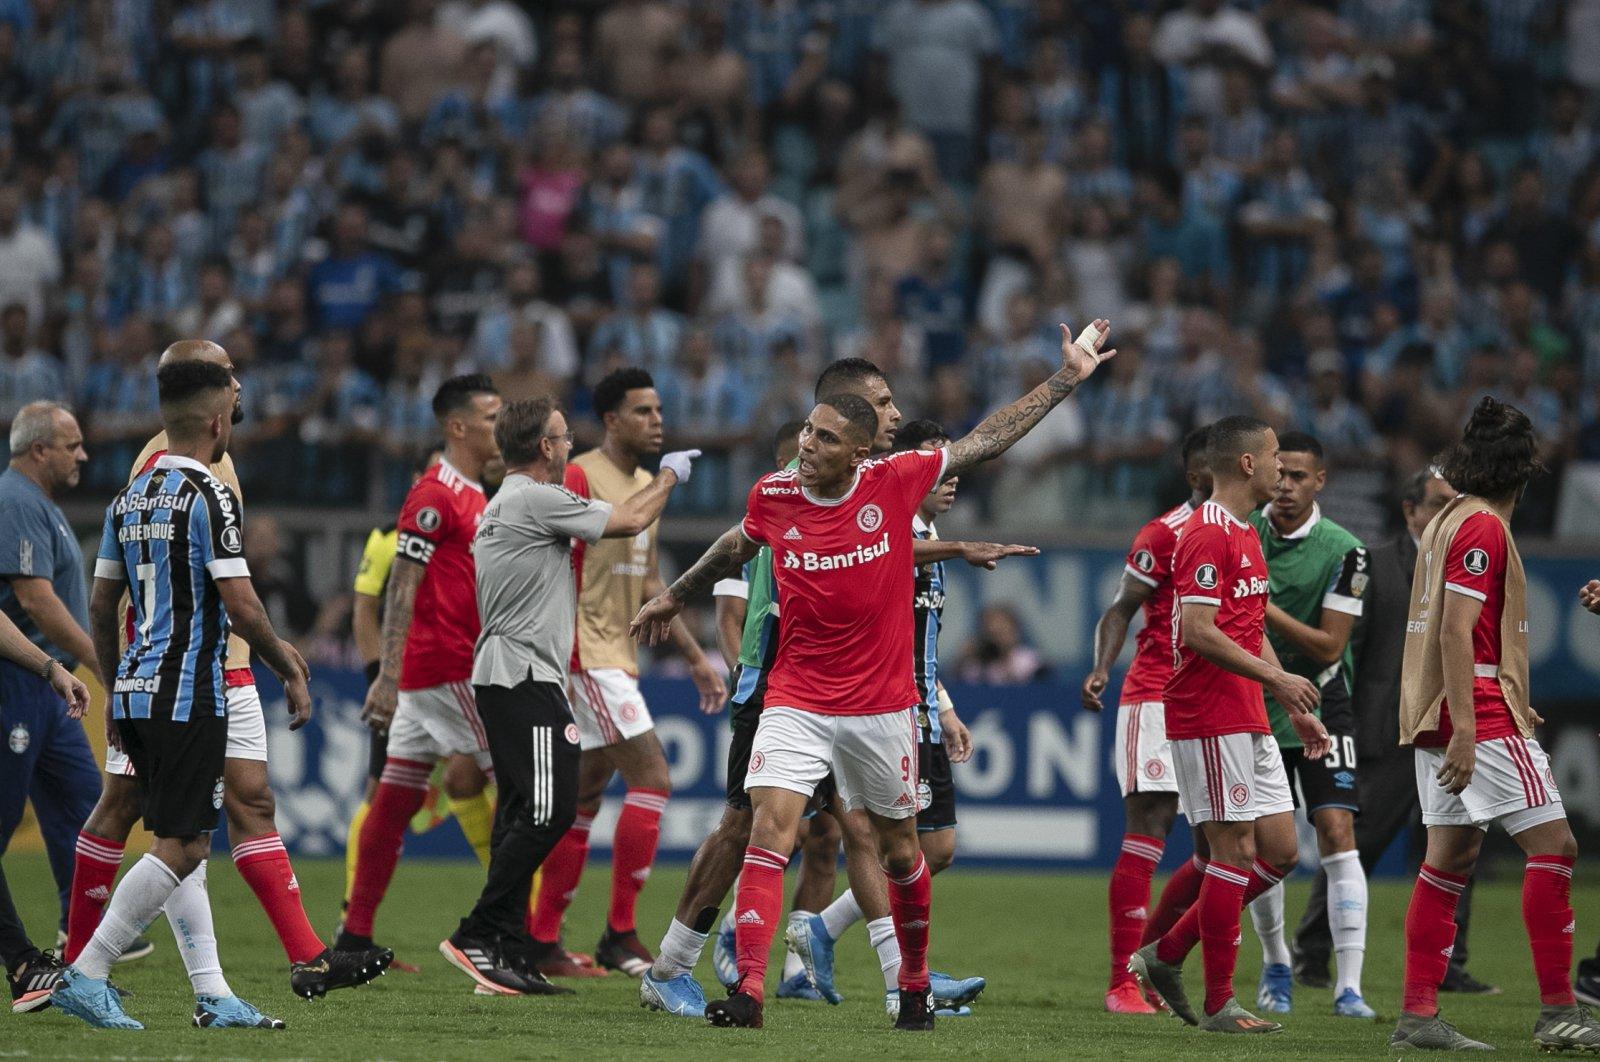 Internacional's Paolo Guerrero (C) argues with Gremio players during a Copa Libertadores match in Porto Alegre, Brazil, March 12, 2020. (AP Photo)